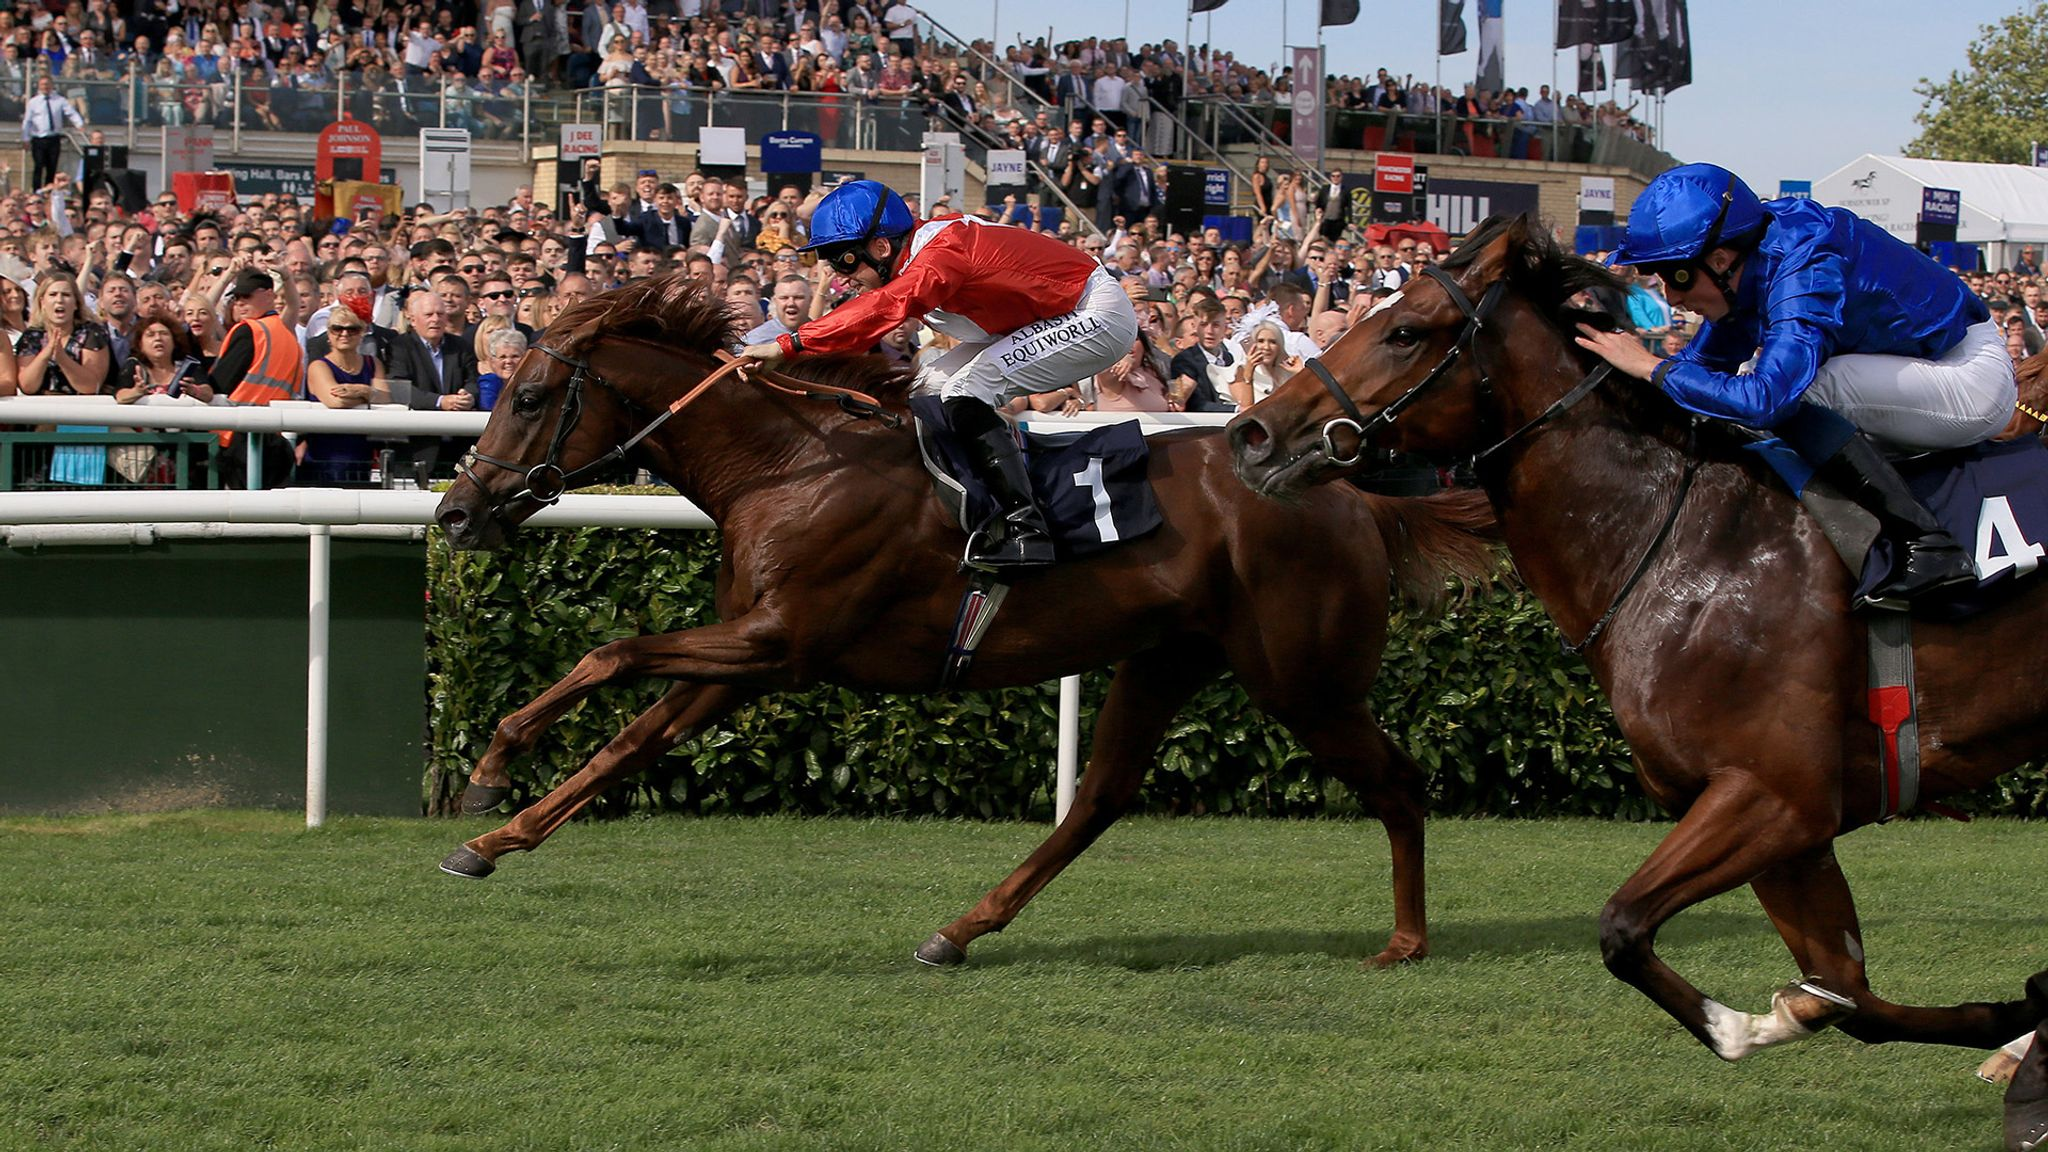 2000 guineas betting 2021 olympics font logo goldbetting